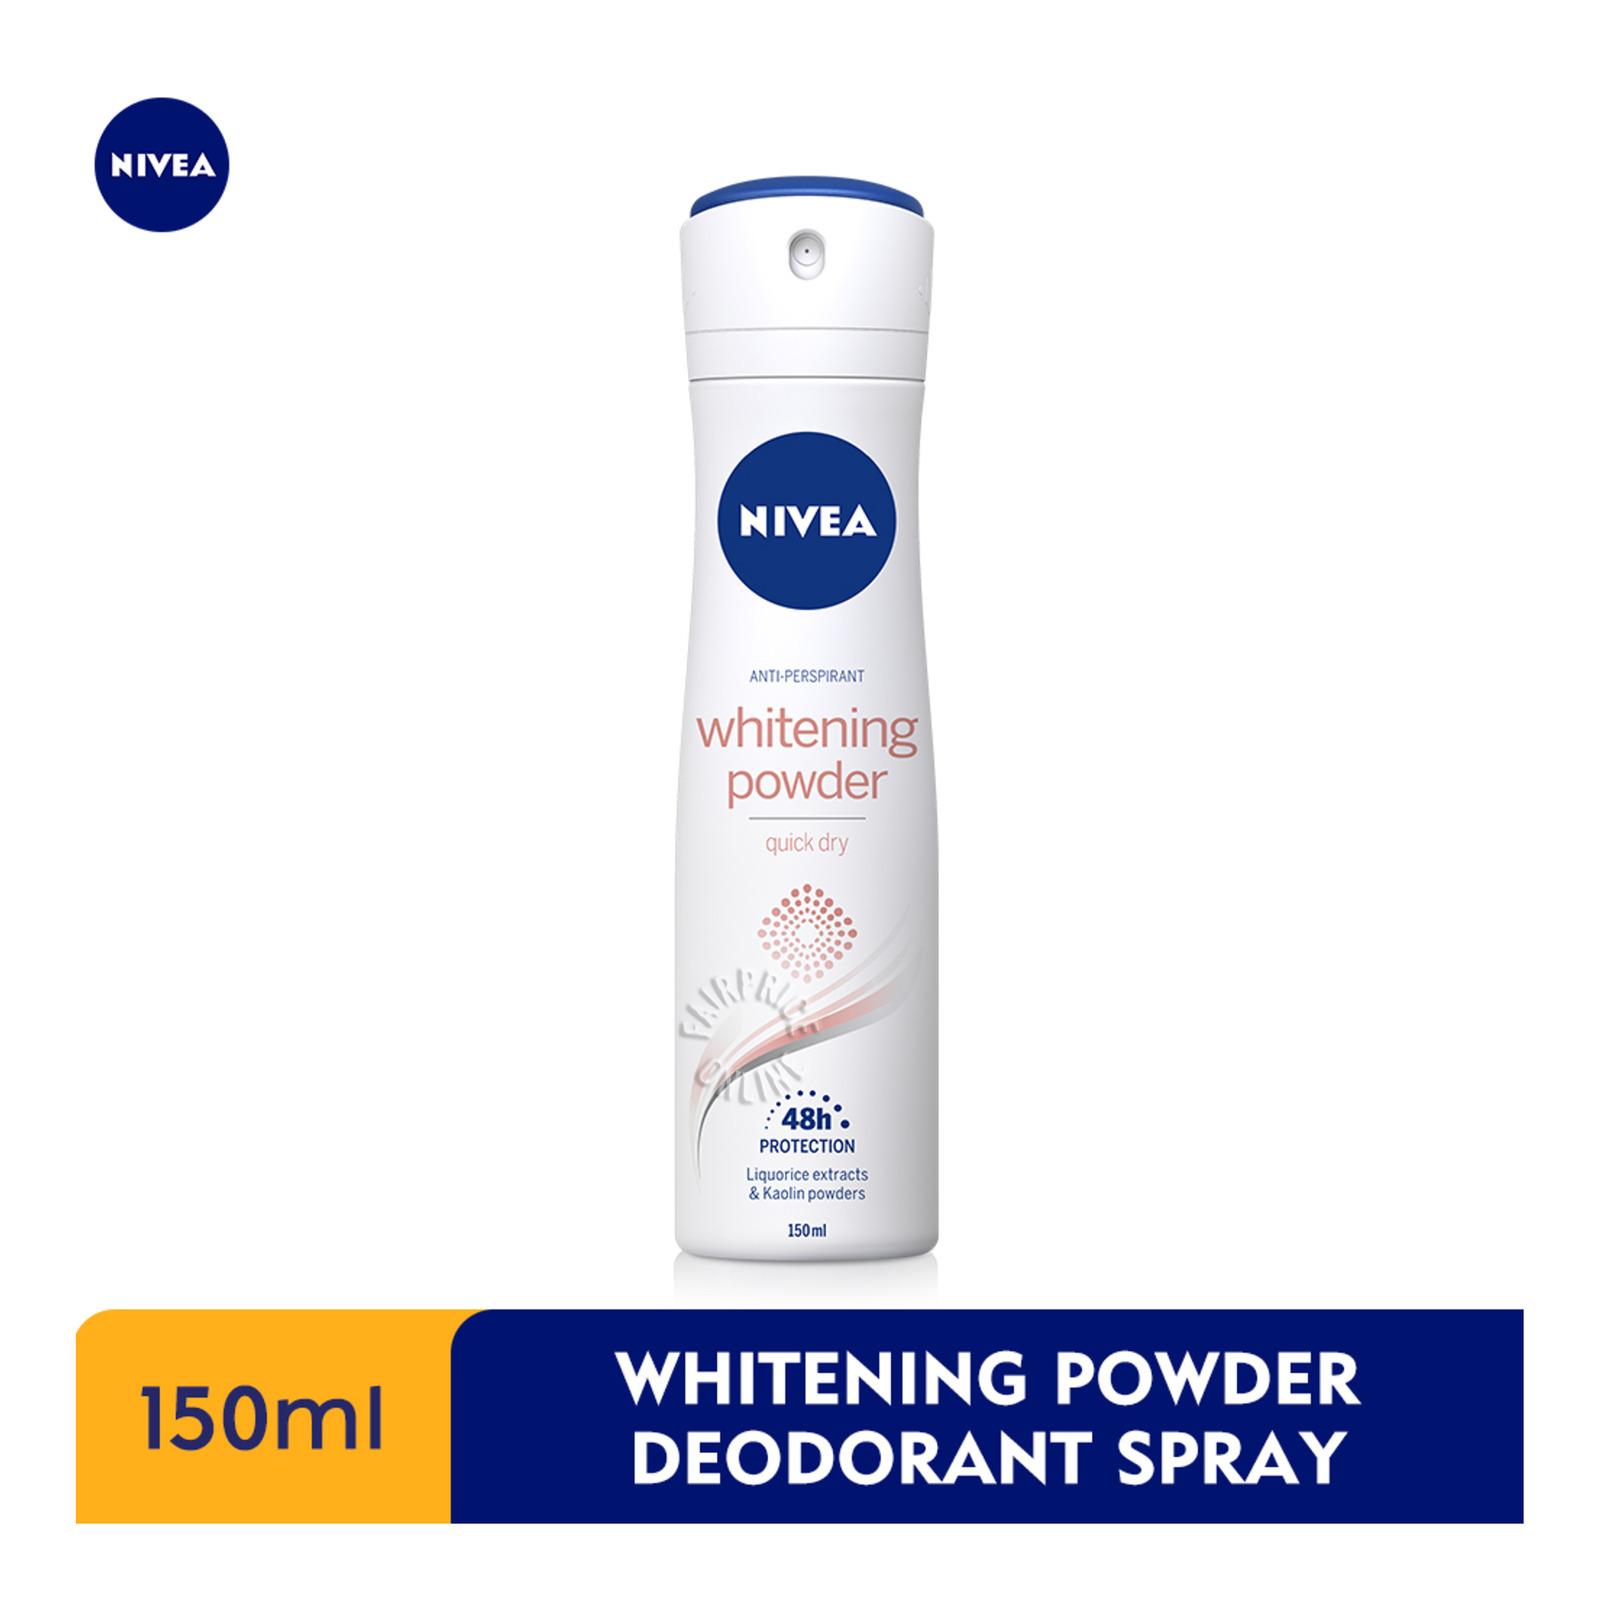 Nivea Anti-Perspirant Deodorant Spray - Whitening Powder